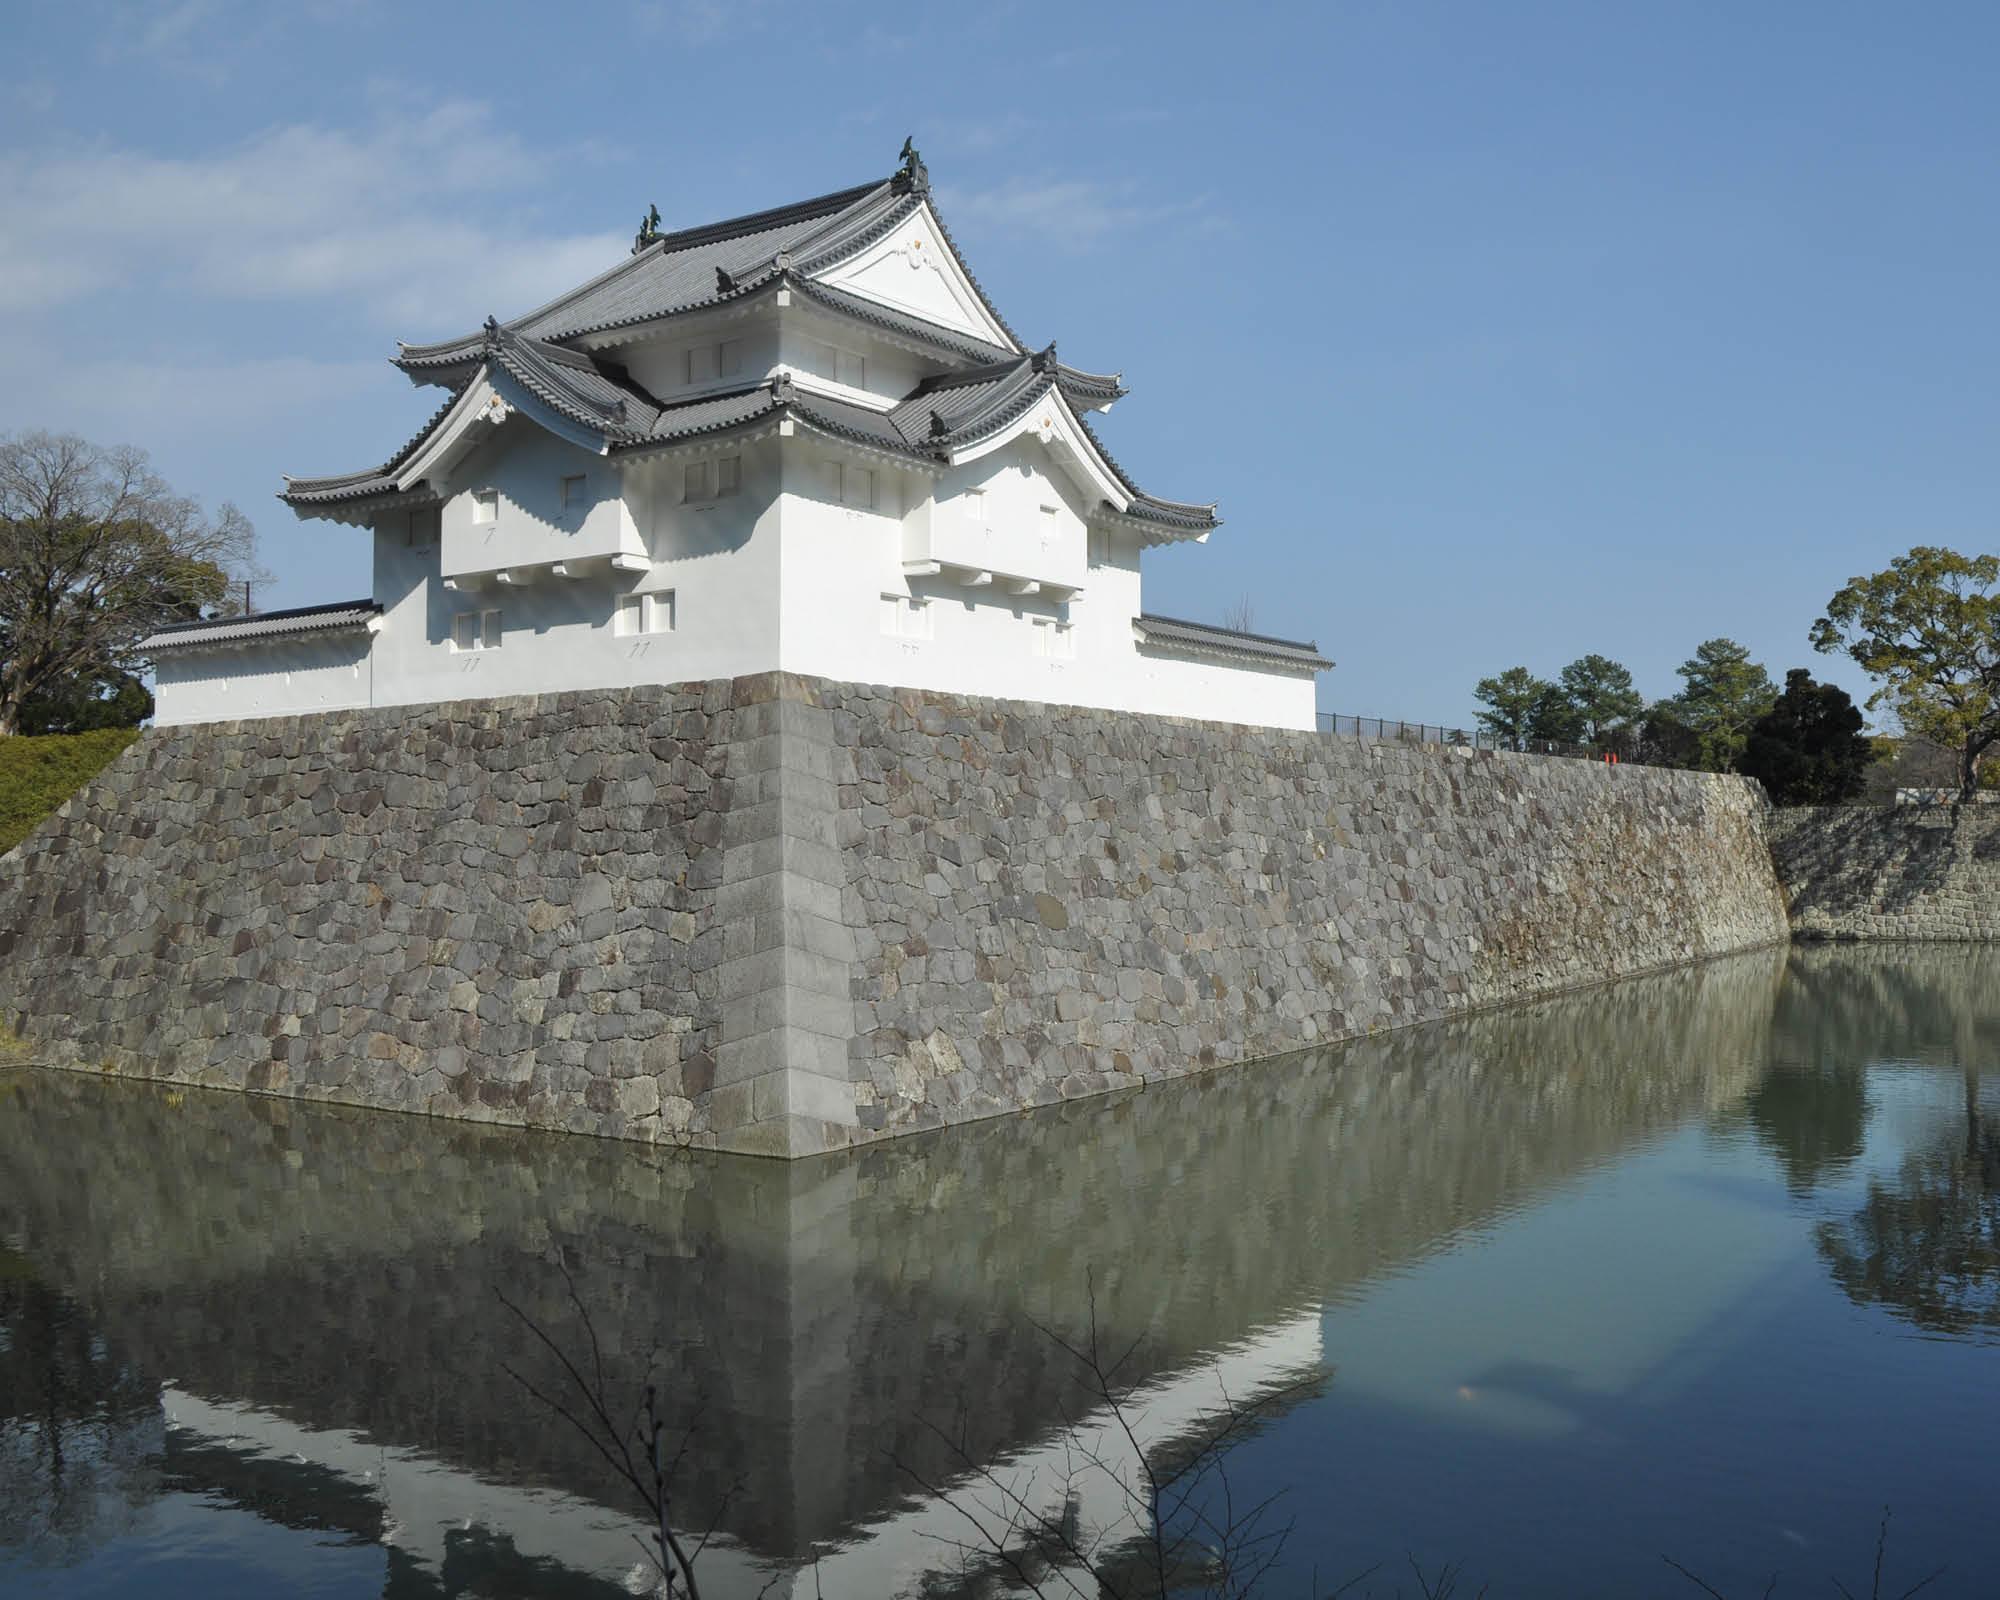 https://www.shizuoka-cb.com/wp-content/uploads/2021/04/photo-why14.jpg